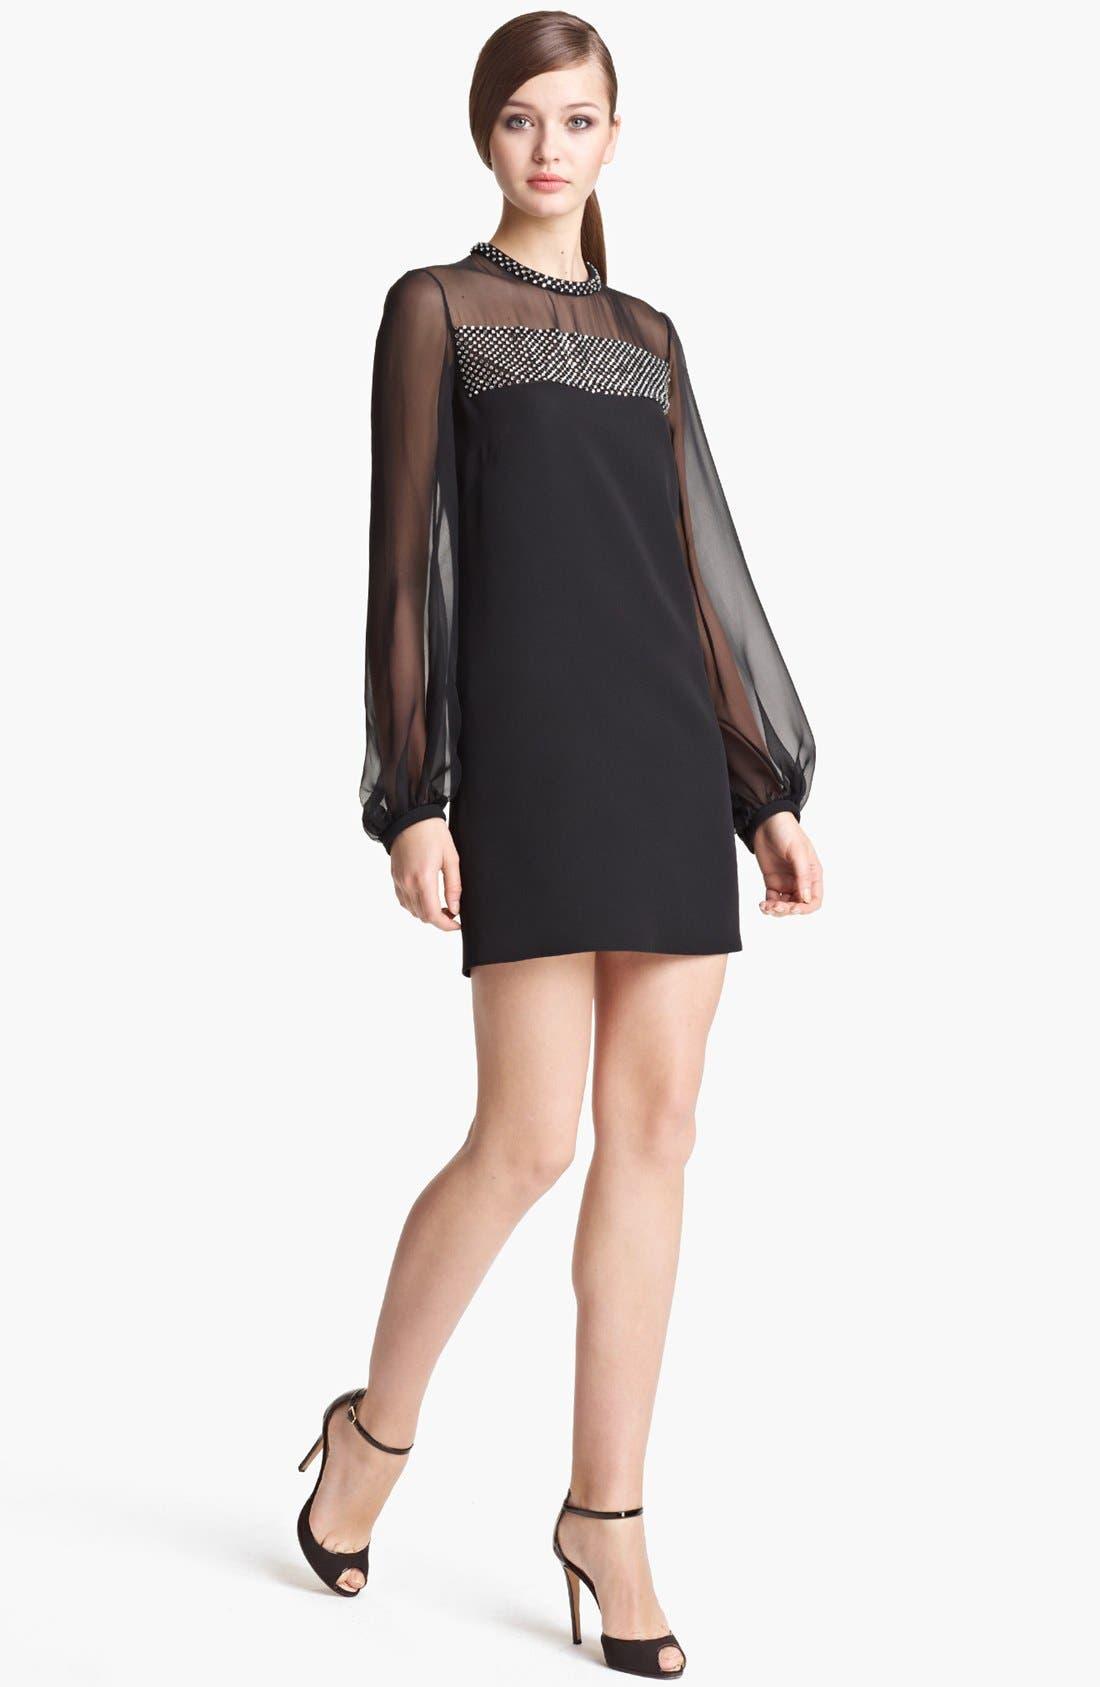 Alternate Image 1 Selected - Emilio Pucci Embellished Dress